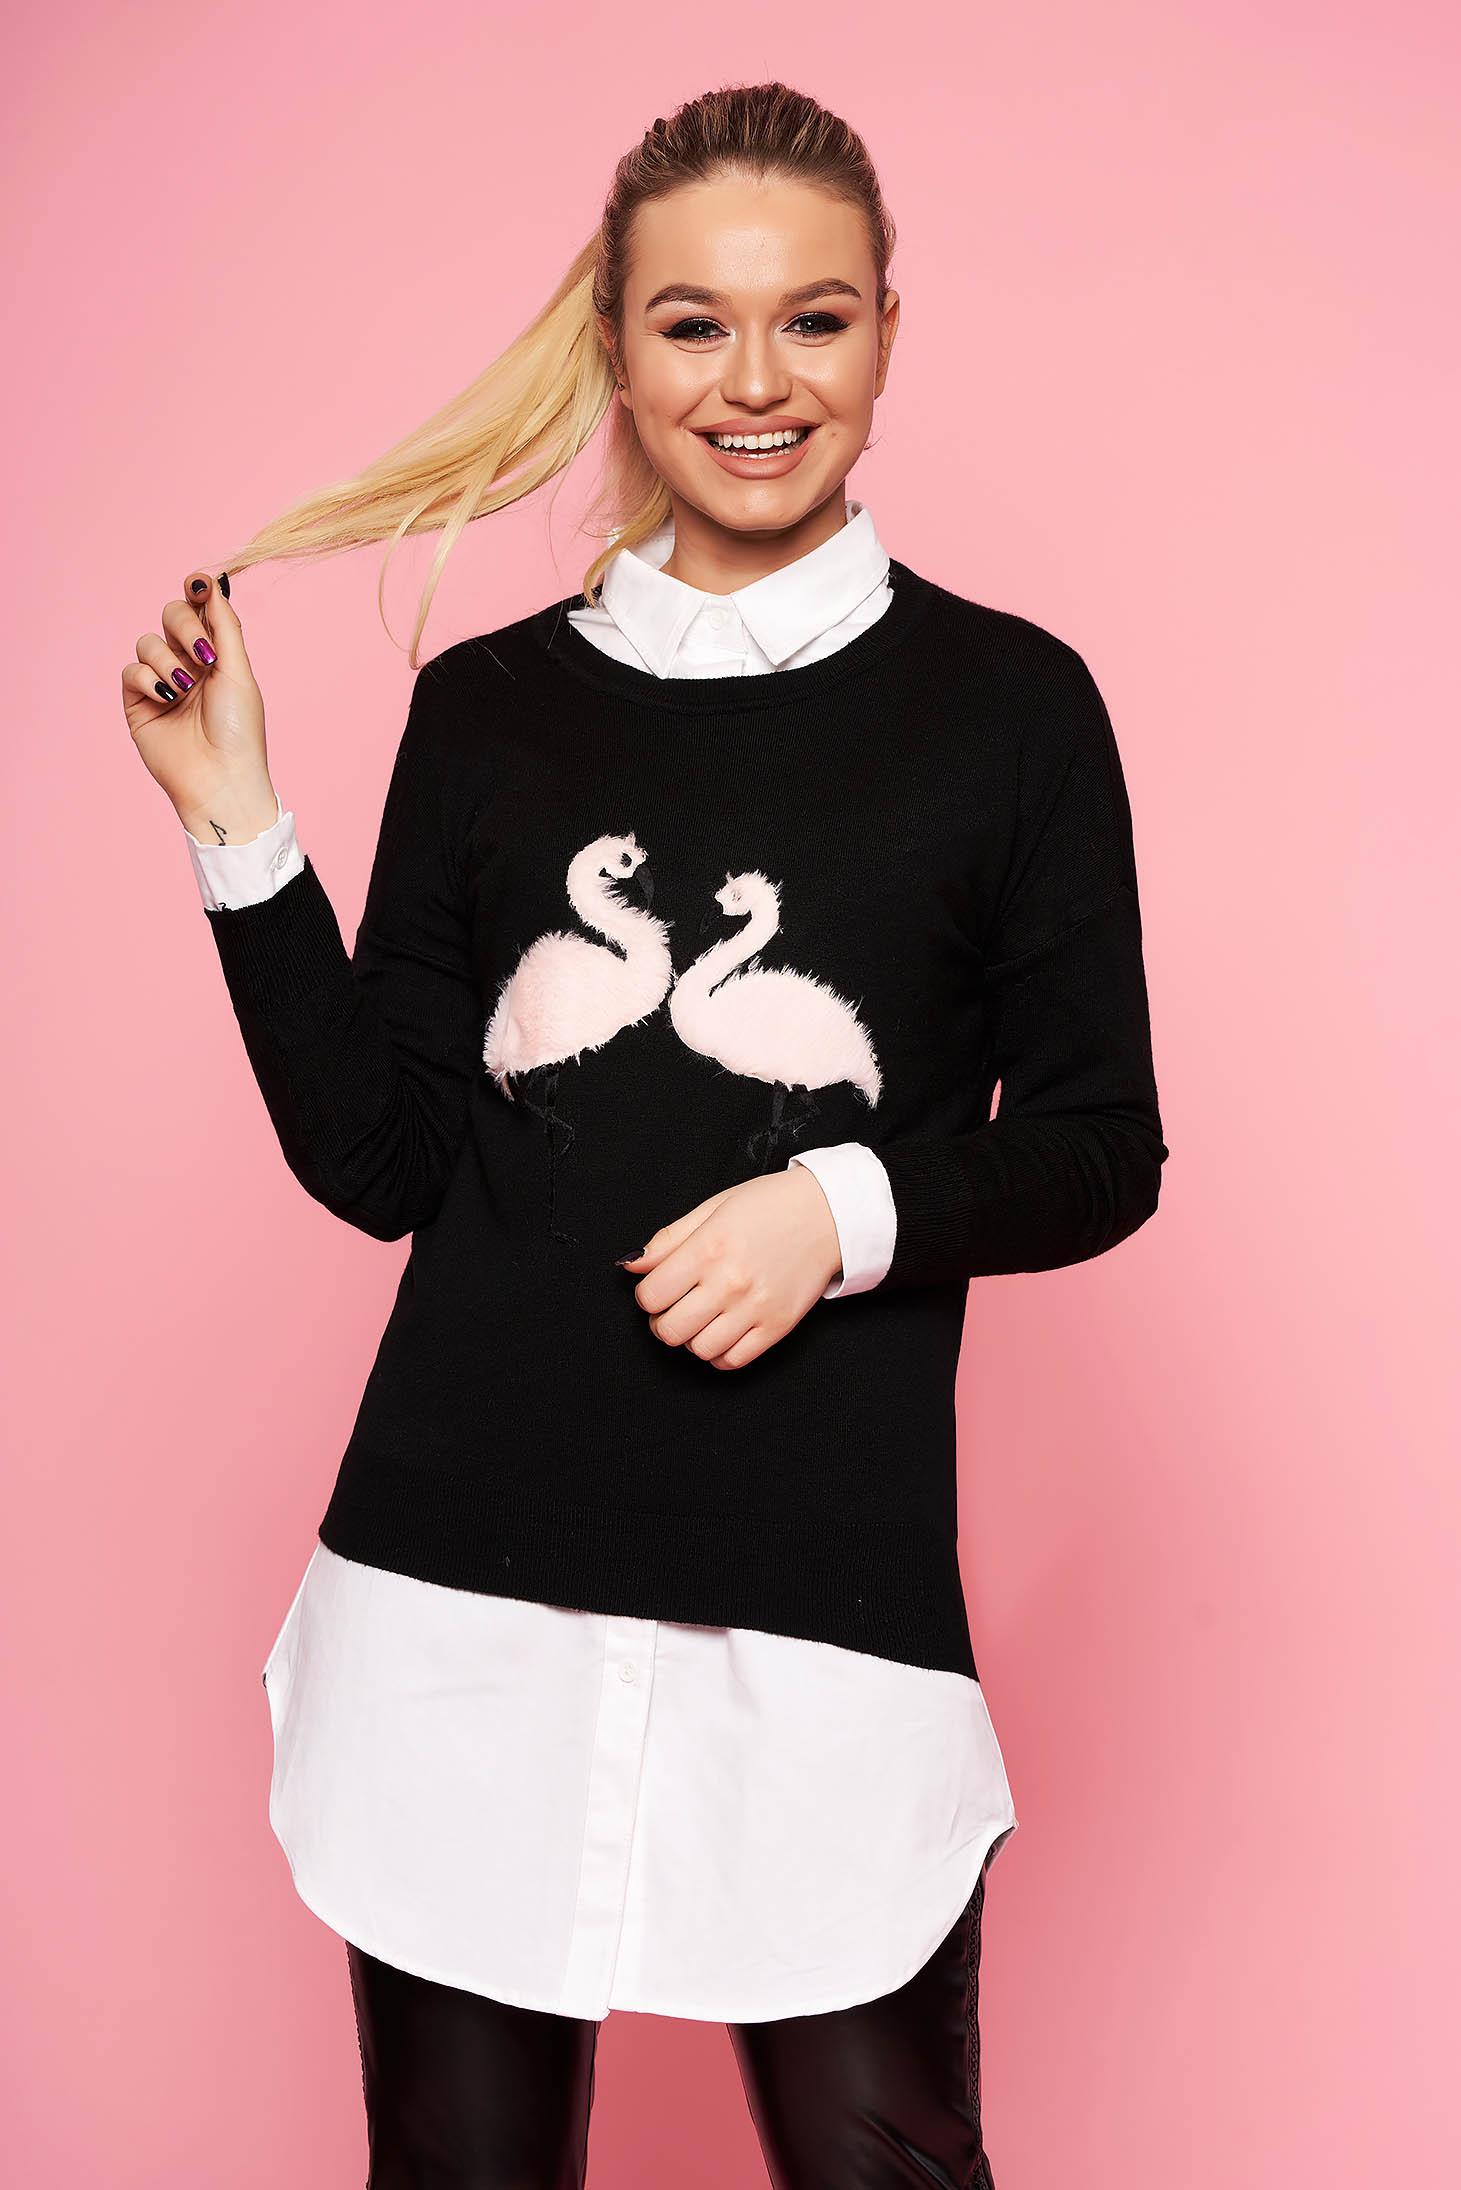 Pulover SunShine negru casual tricotat scurt cu croi larg cu decolteu la baza gatului si insertii cu blana ecologica